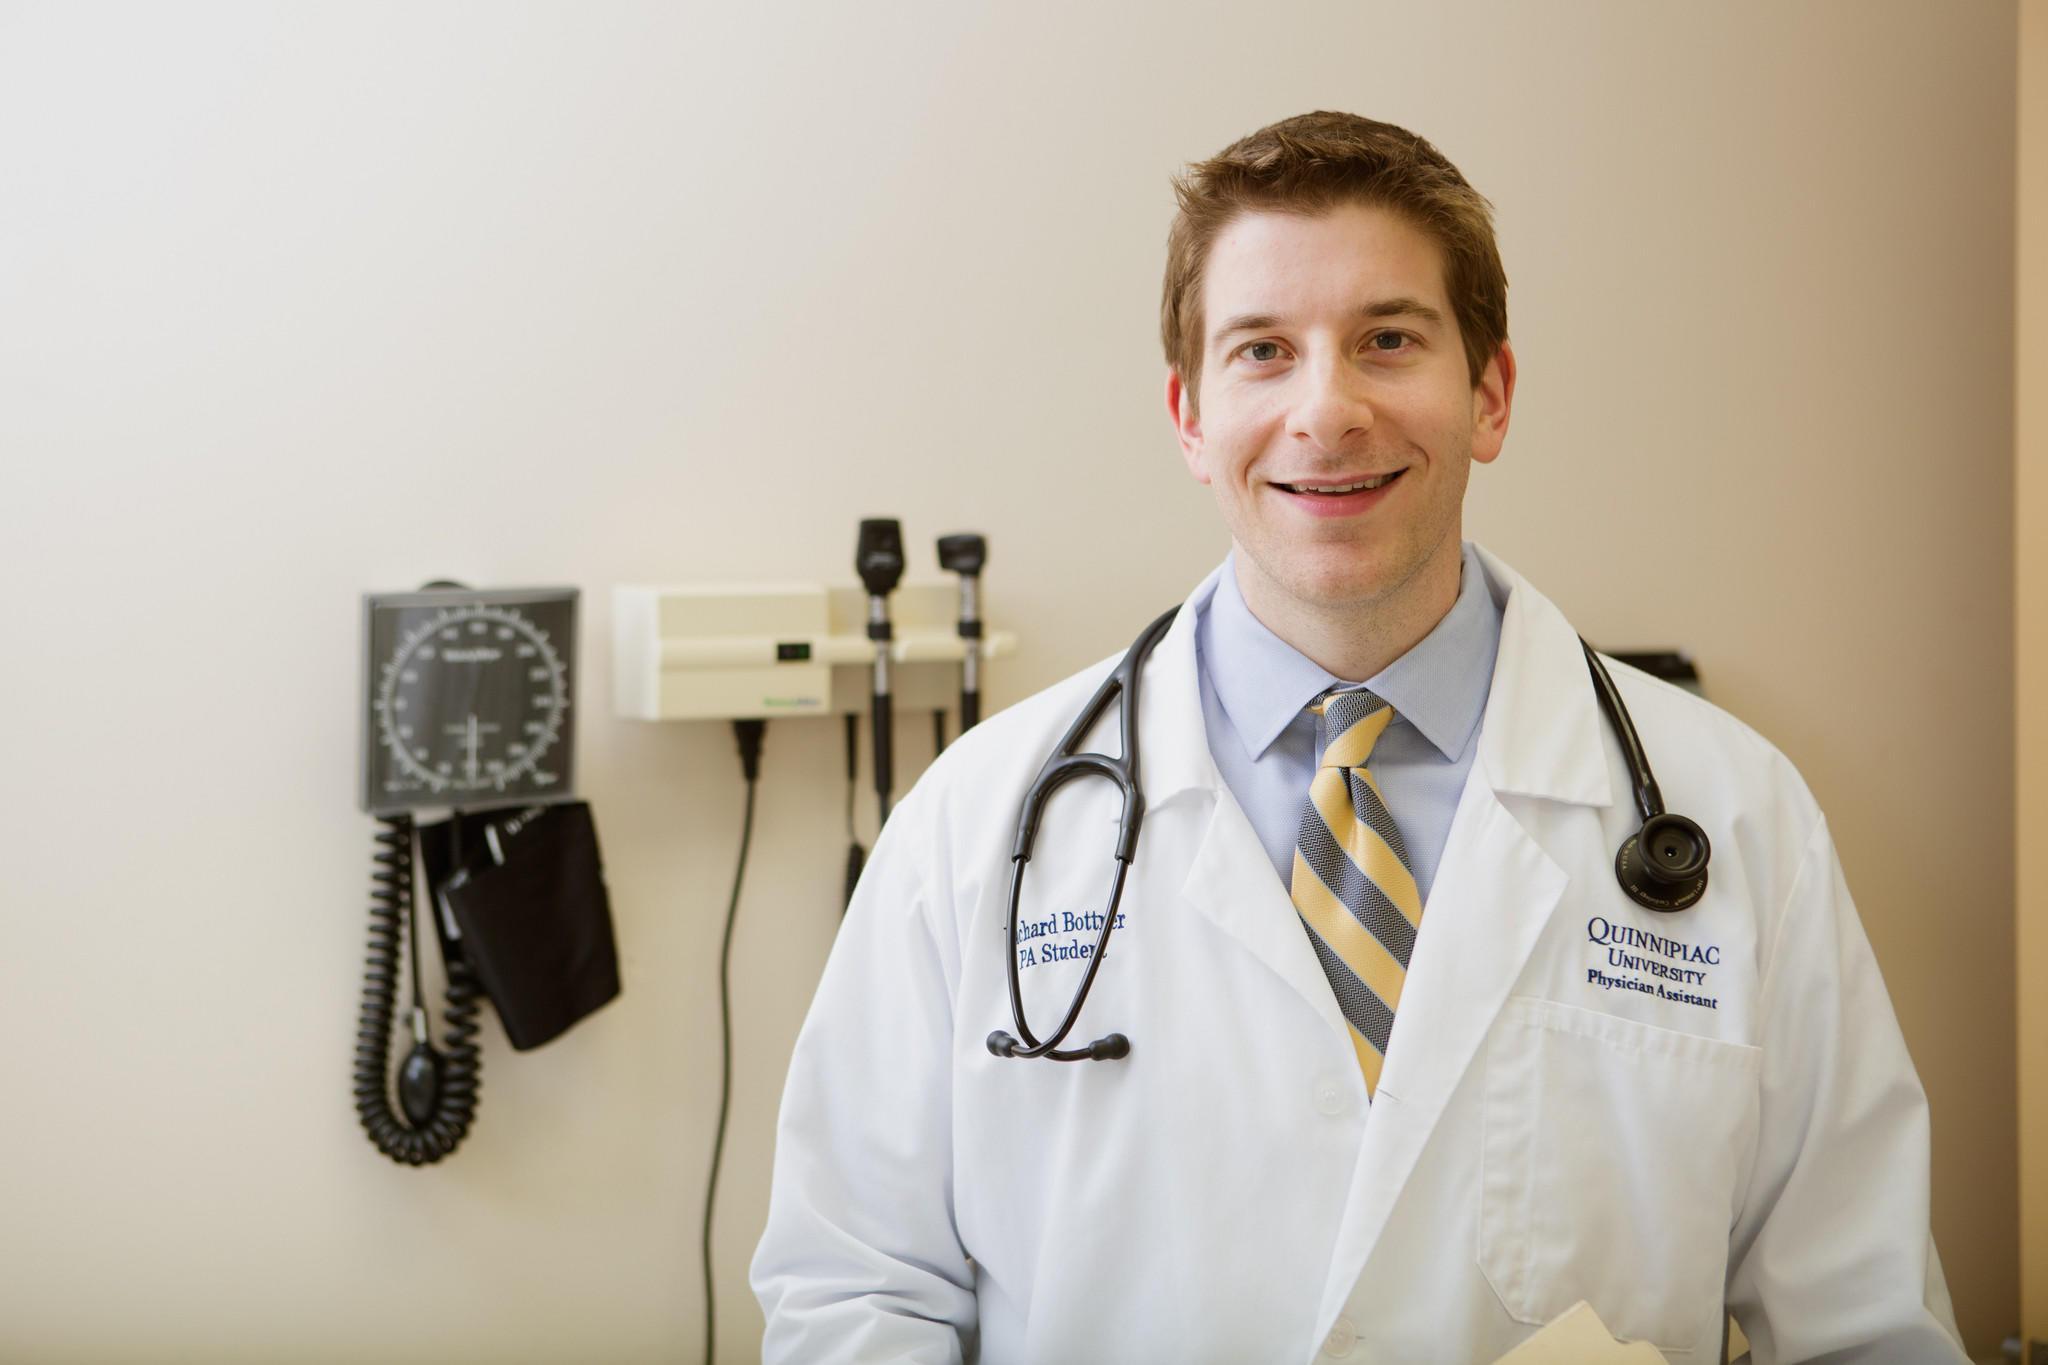 Richard Bottner, a Quinnipiac University physician assistant student, is an urban health scholar.